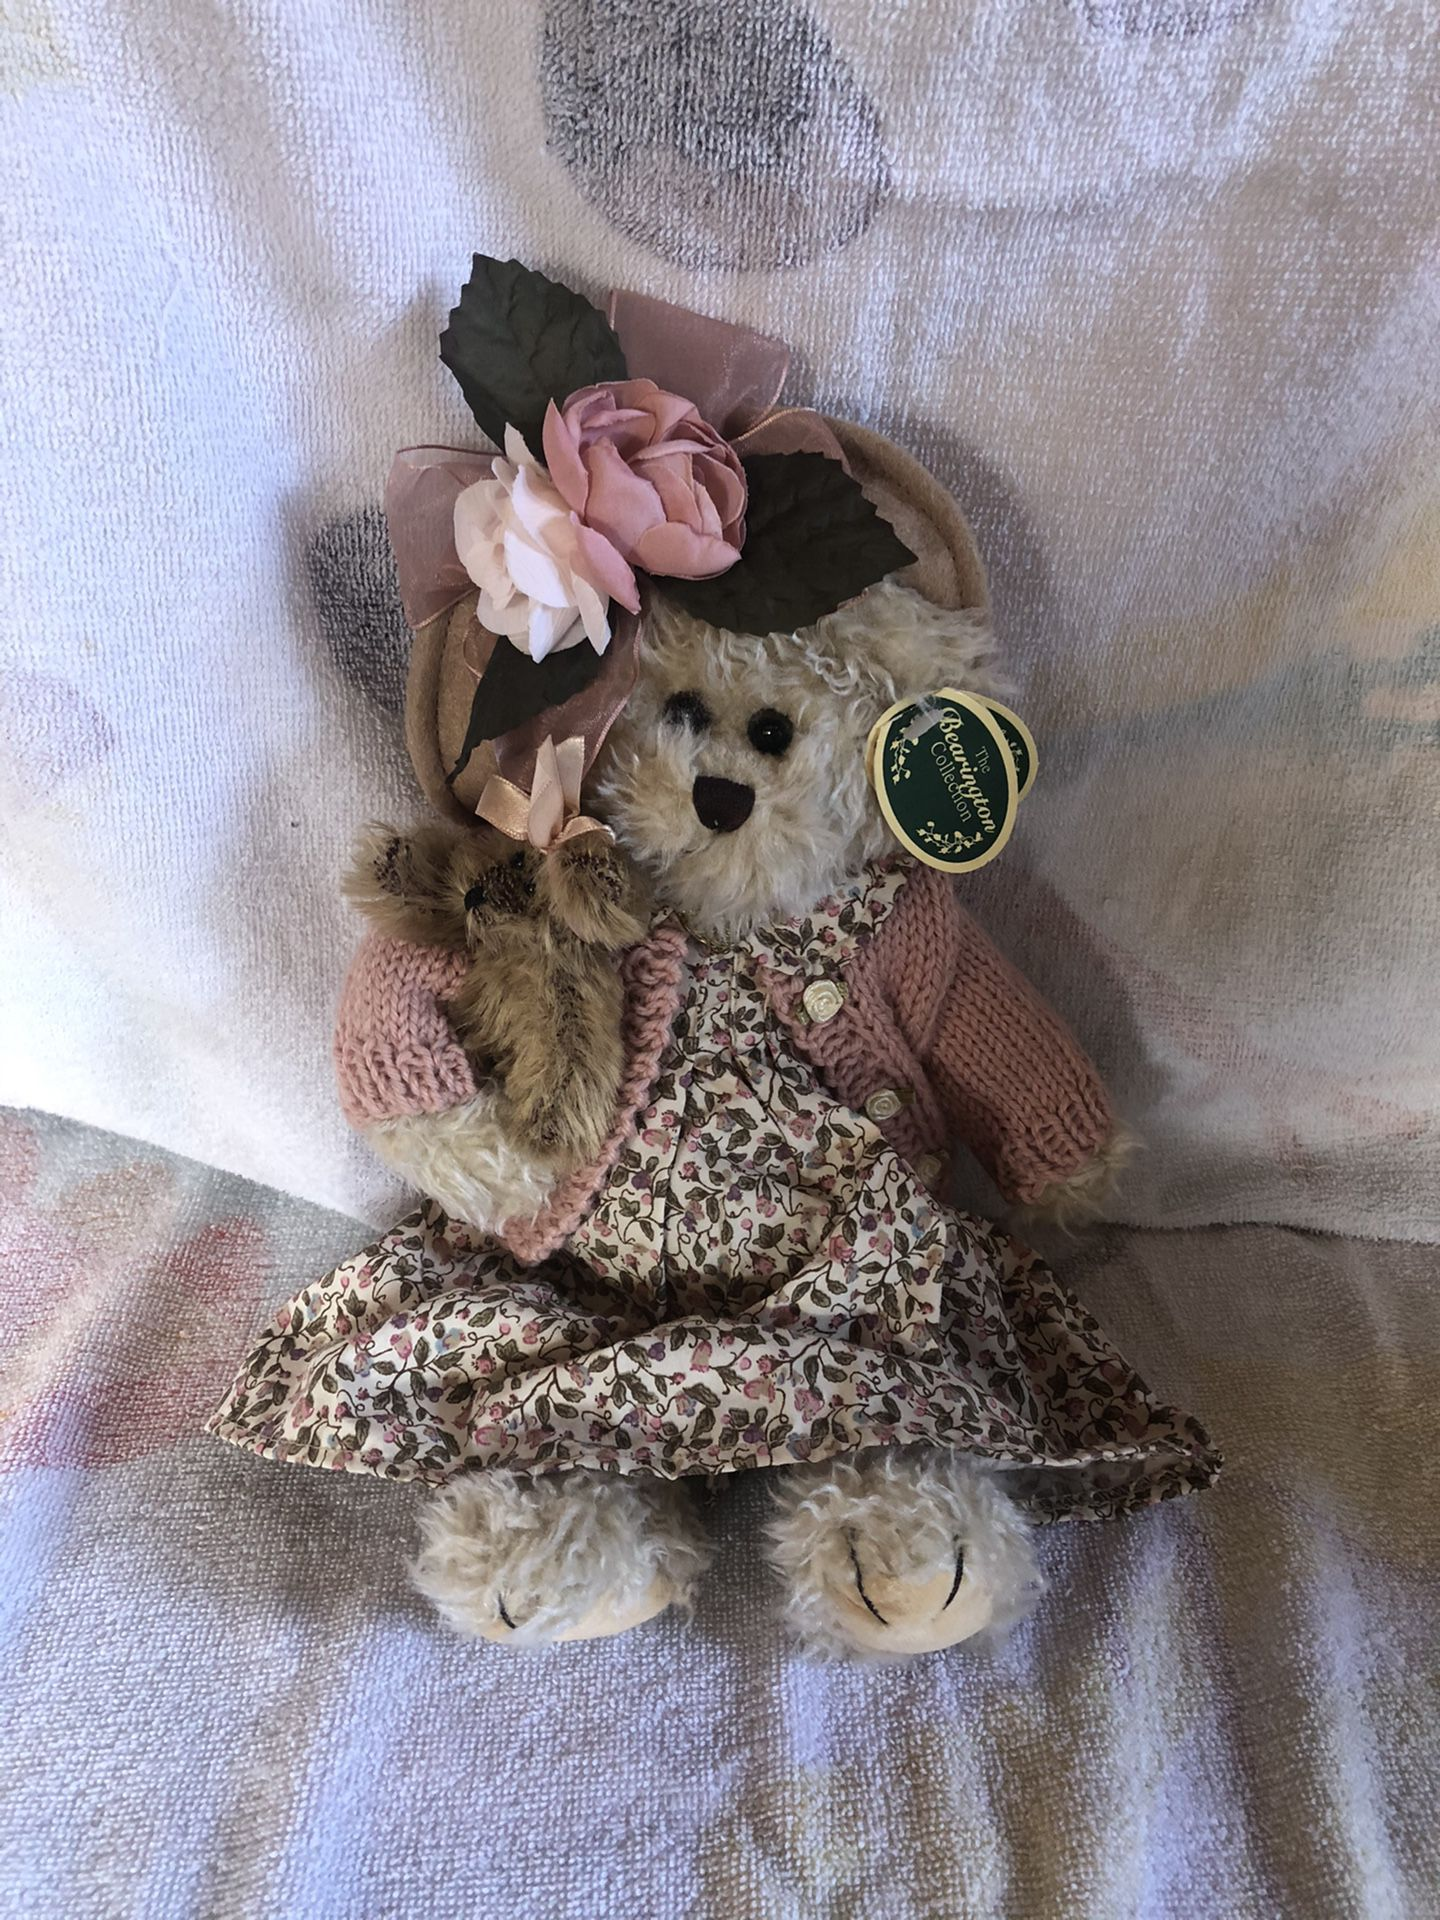 Collectible Bearington Bears Handcrafted Daisy and Belle # 1069 plush Teddy Bear